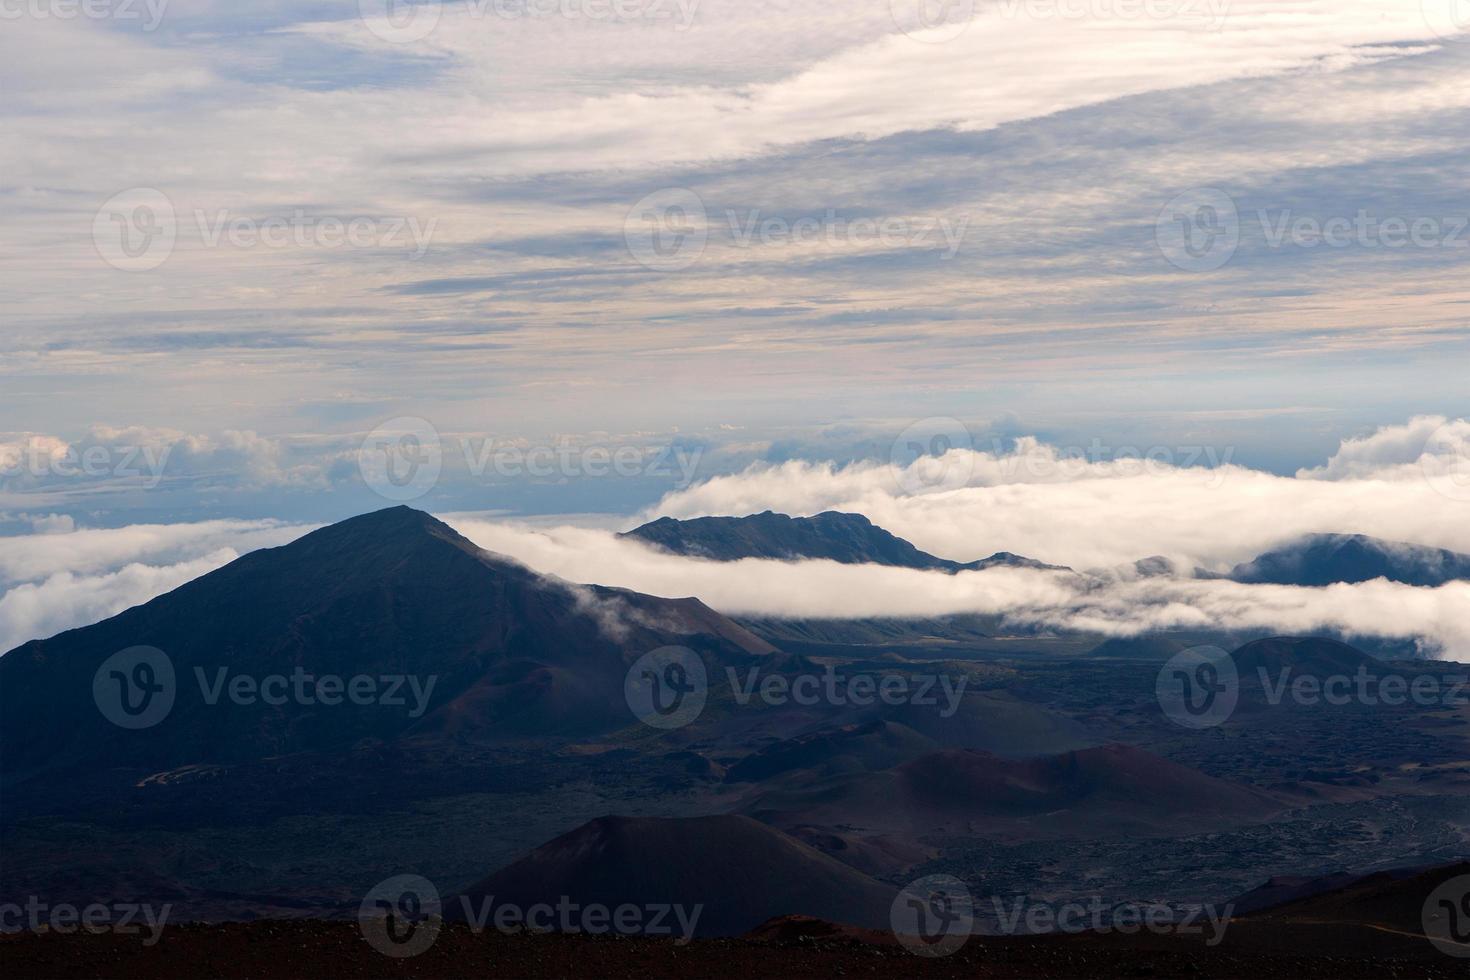 cratere haleakala da sopra le nuvole foto